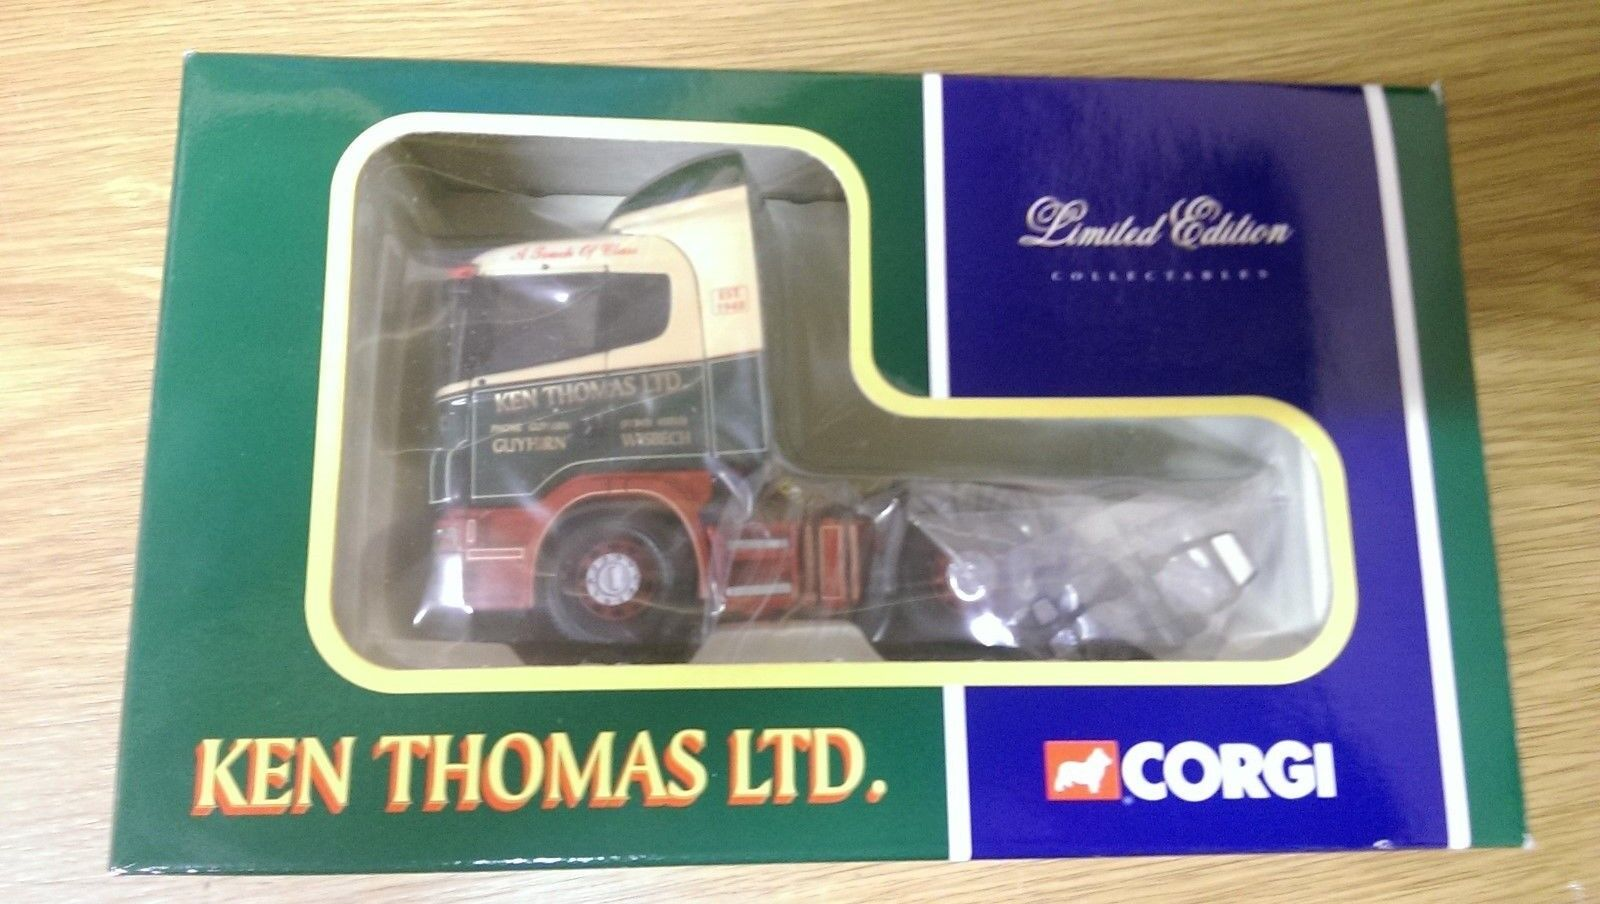 Corgi CC12214 Scania 4 series Tractor Unit Ken Thomas Ltd Ltd Edition 0001 3200